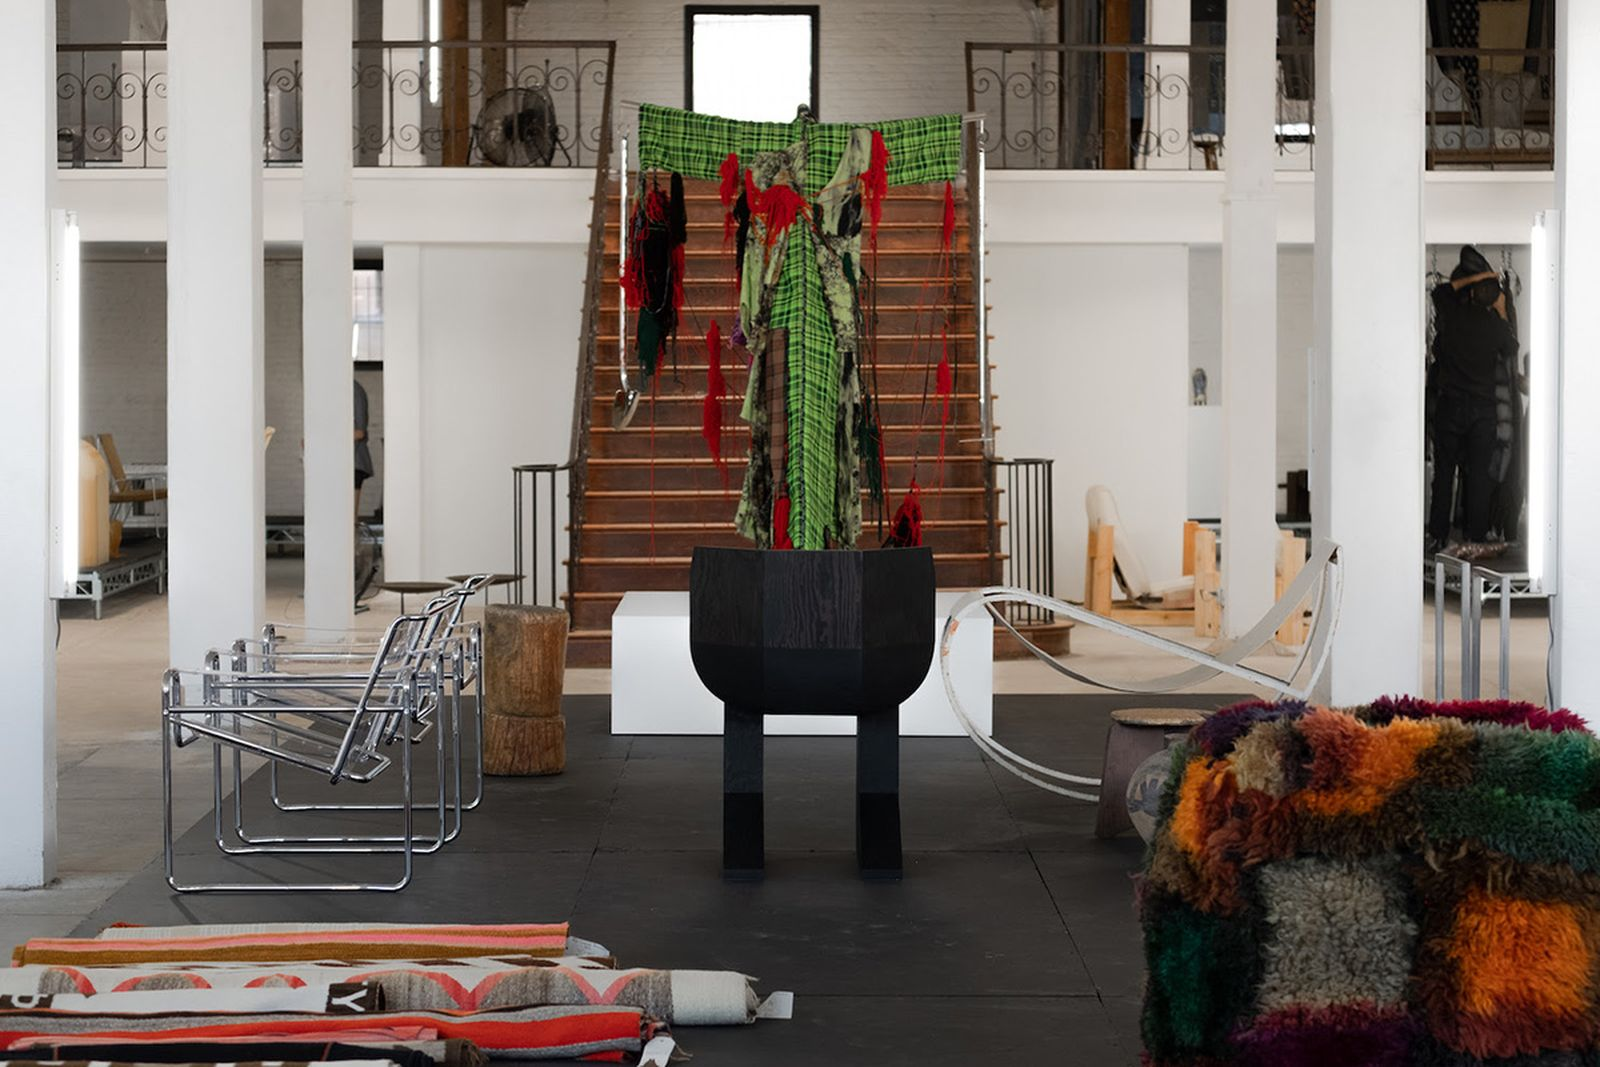 sized-los-angeles-exhibition-luka-sabbat-01